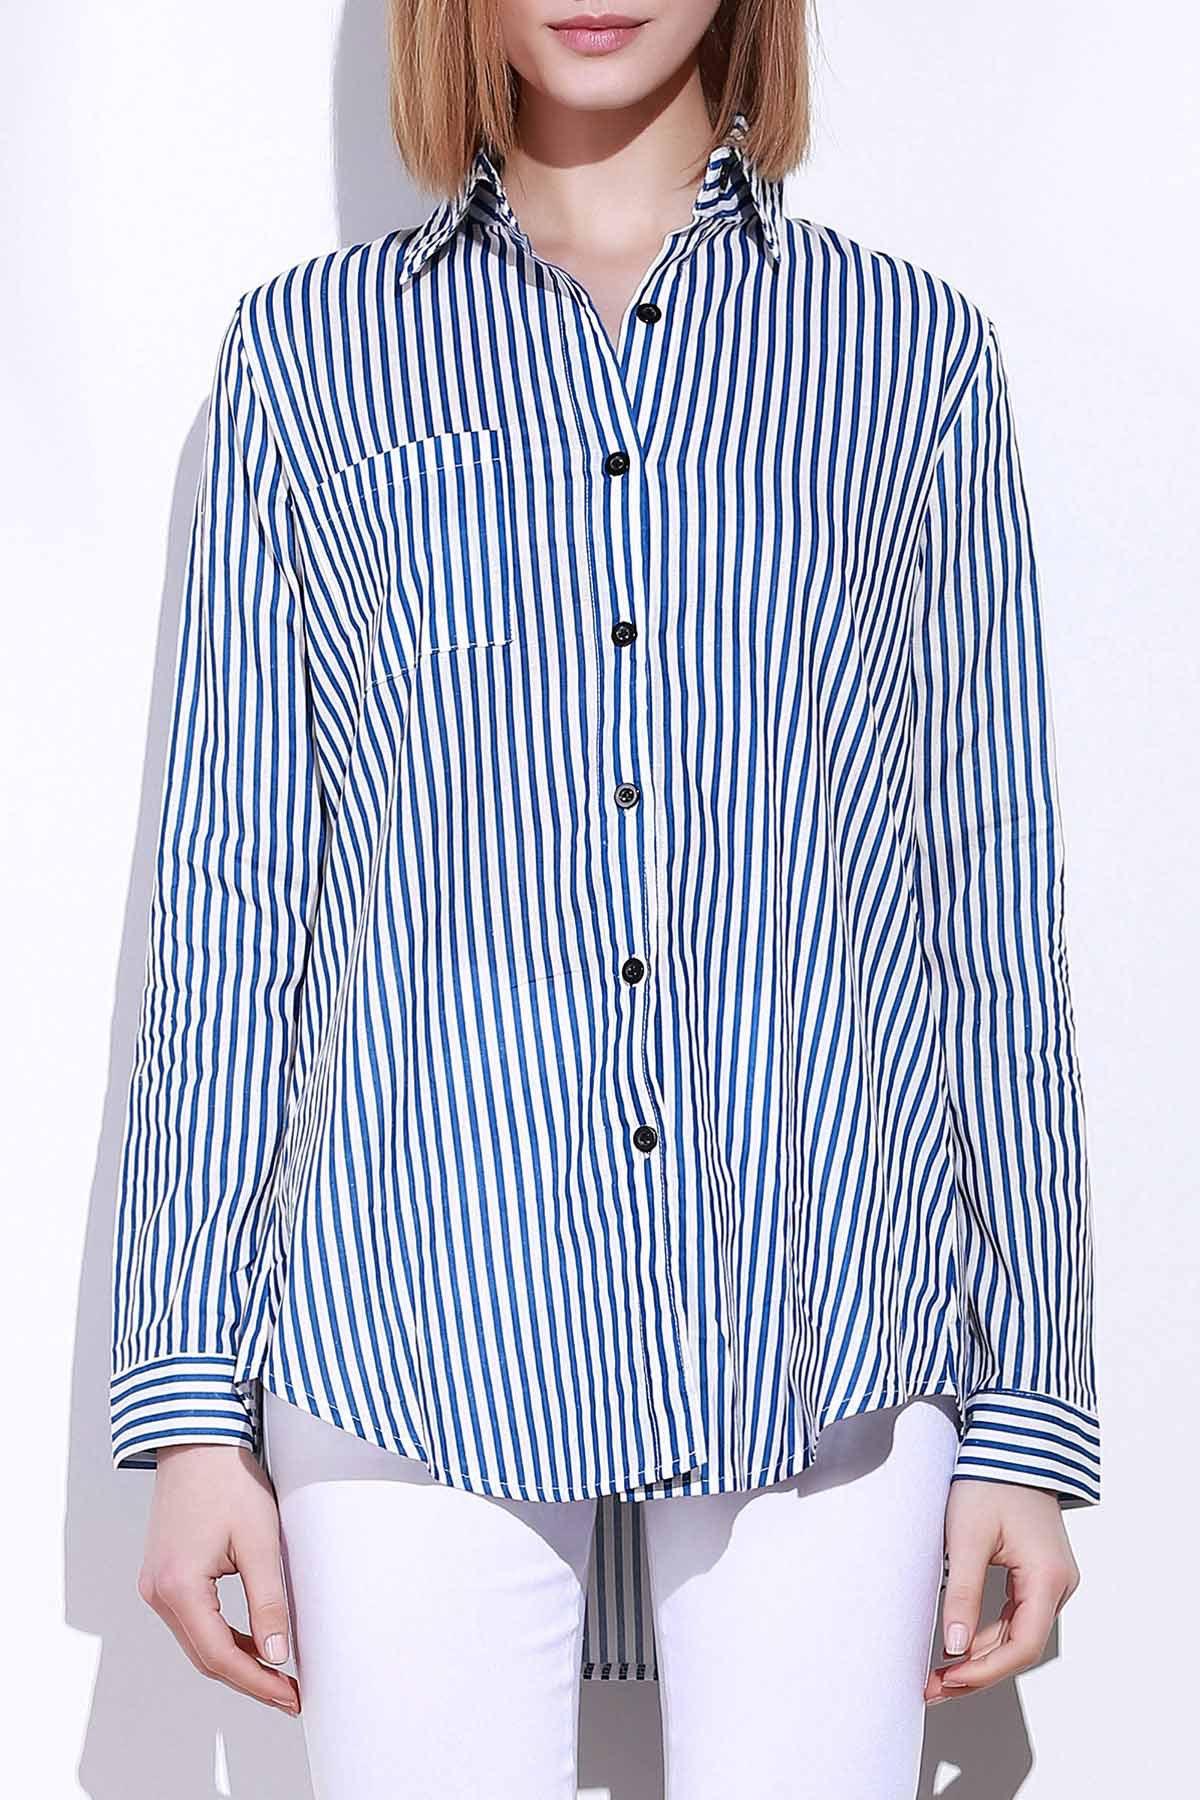 Blue White Stripes Long Sleeve Shirt 144905103